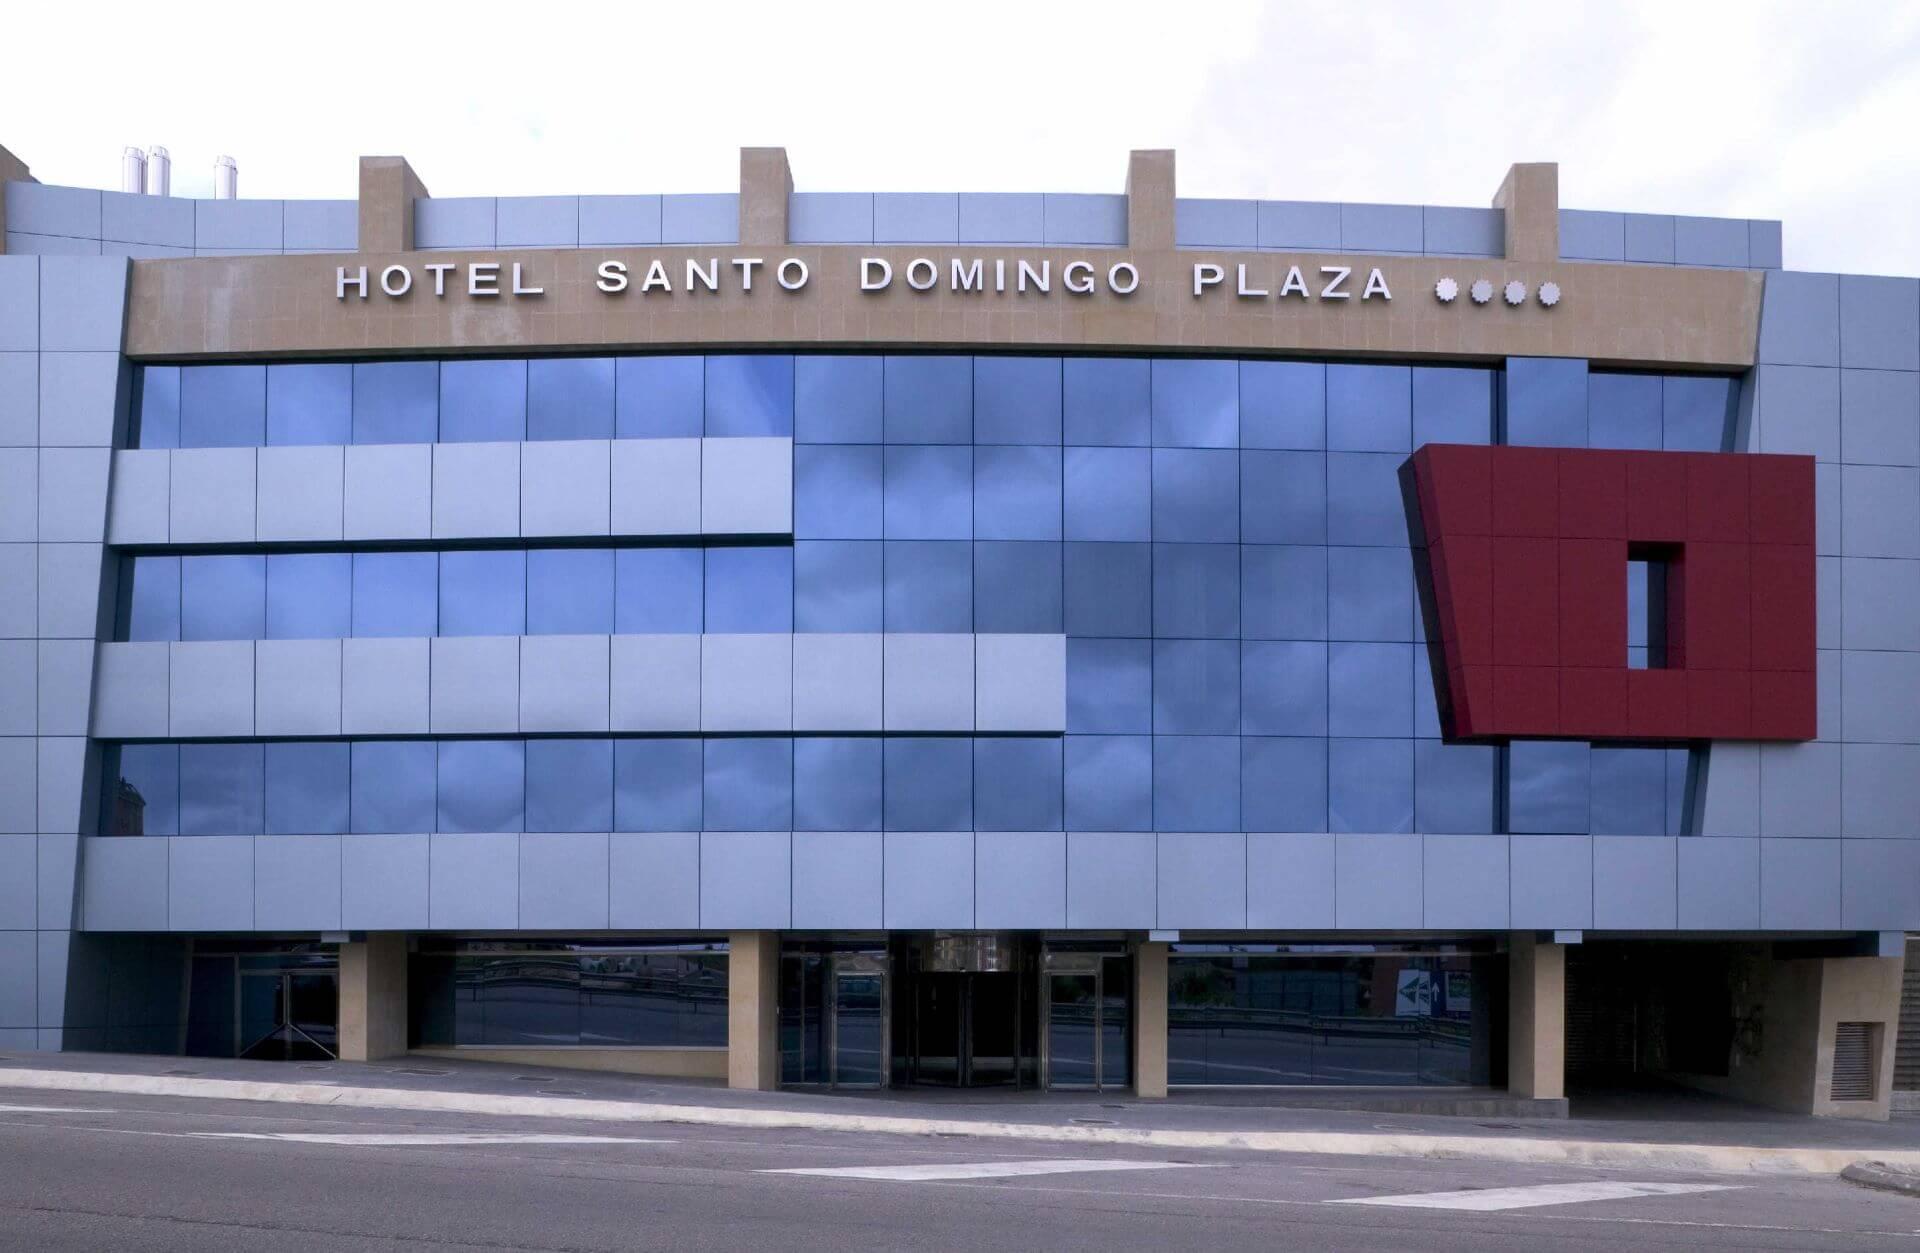 https://iberikhoteles.com//resources/hotels/santo-domingo/fachada.jpg